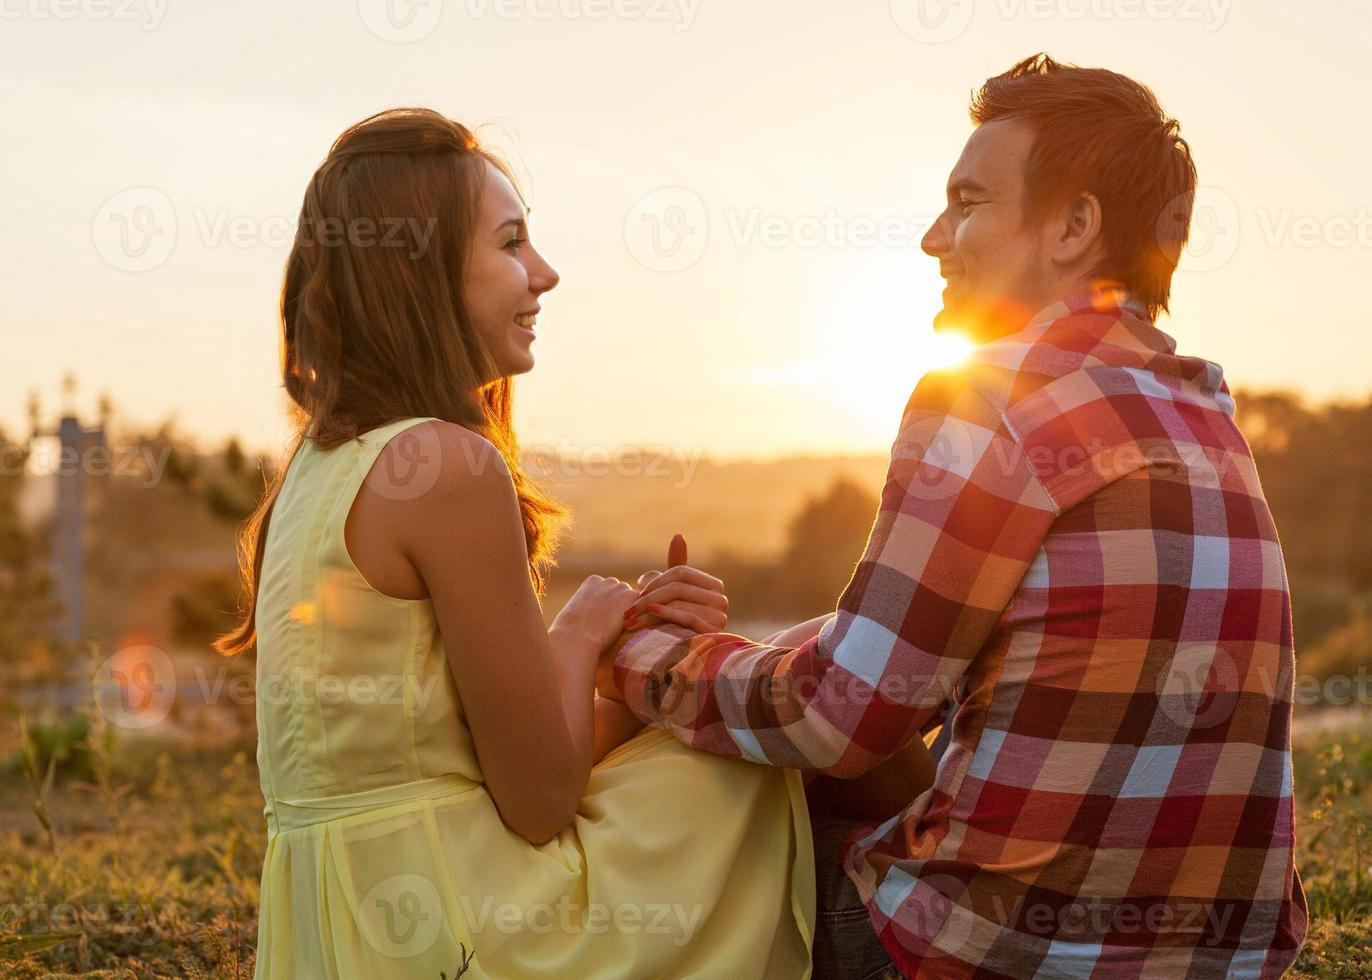 ungt par förälskat utomhus foto